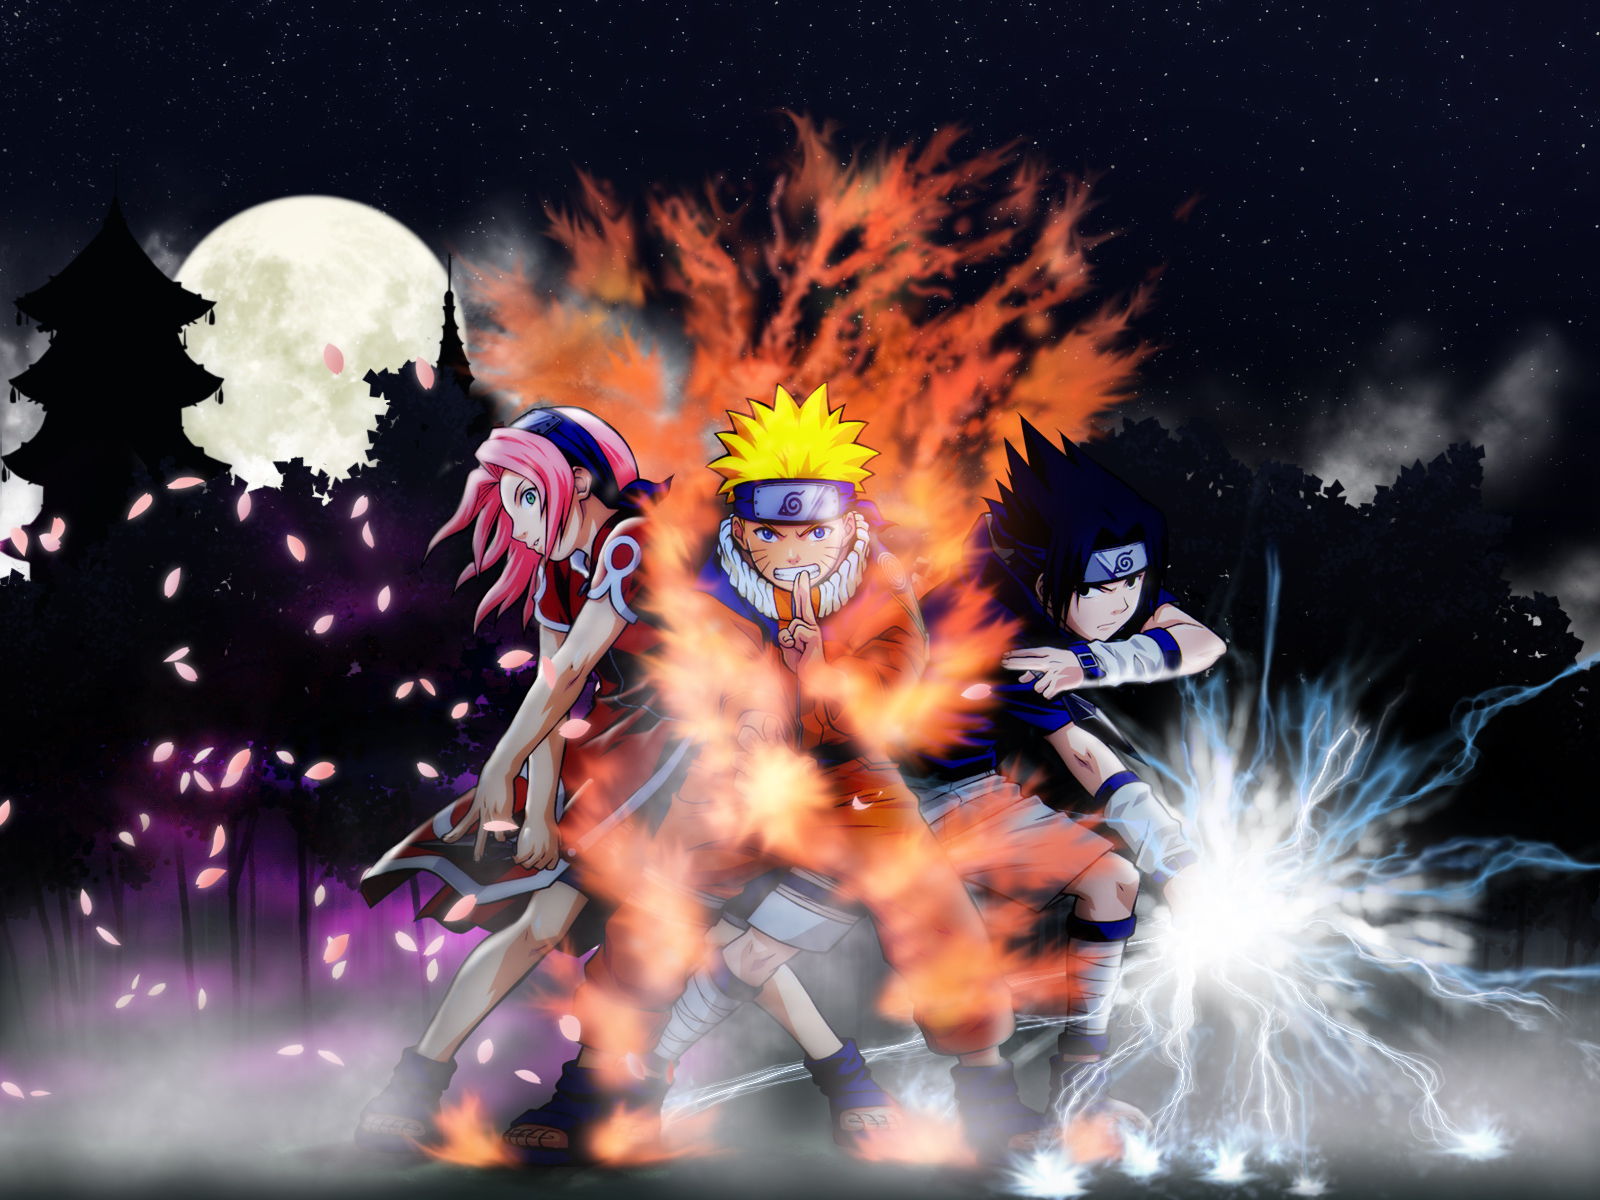 http://2.bp.blogspot.com/-P5tQW2Gycek/T9Sj5YQk93I/AAAAAAAAFSo/Xo0PHqCnhuY/s1600/Naruto-wallpaper-17.jpeg